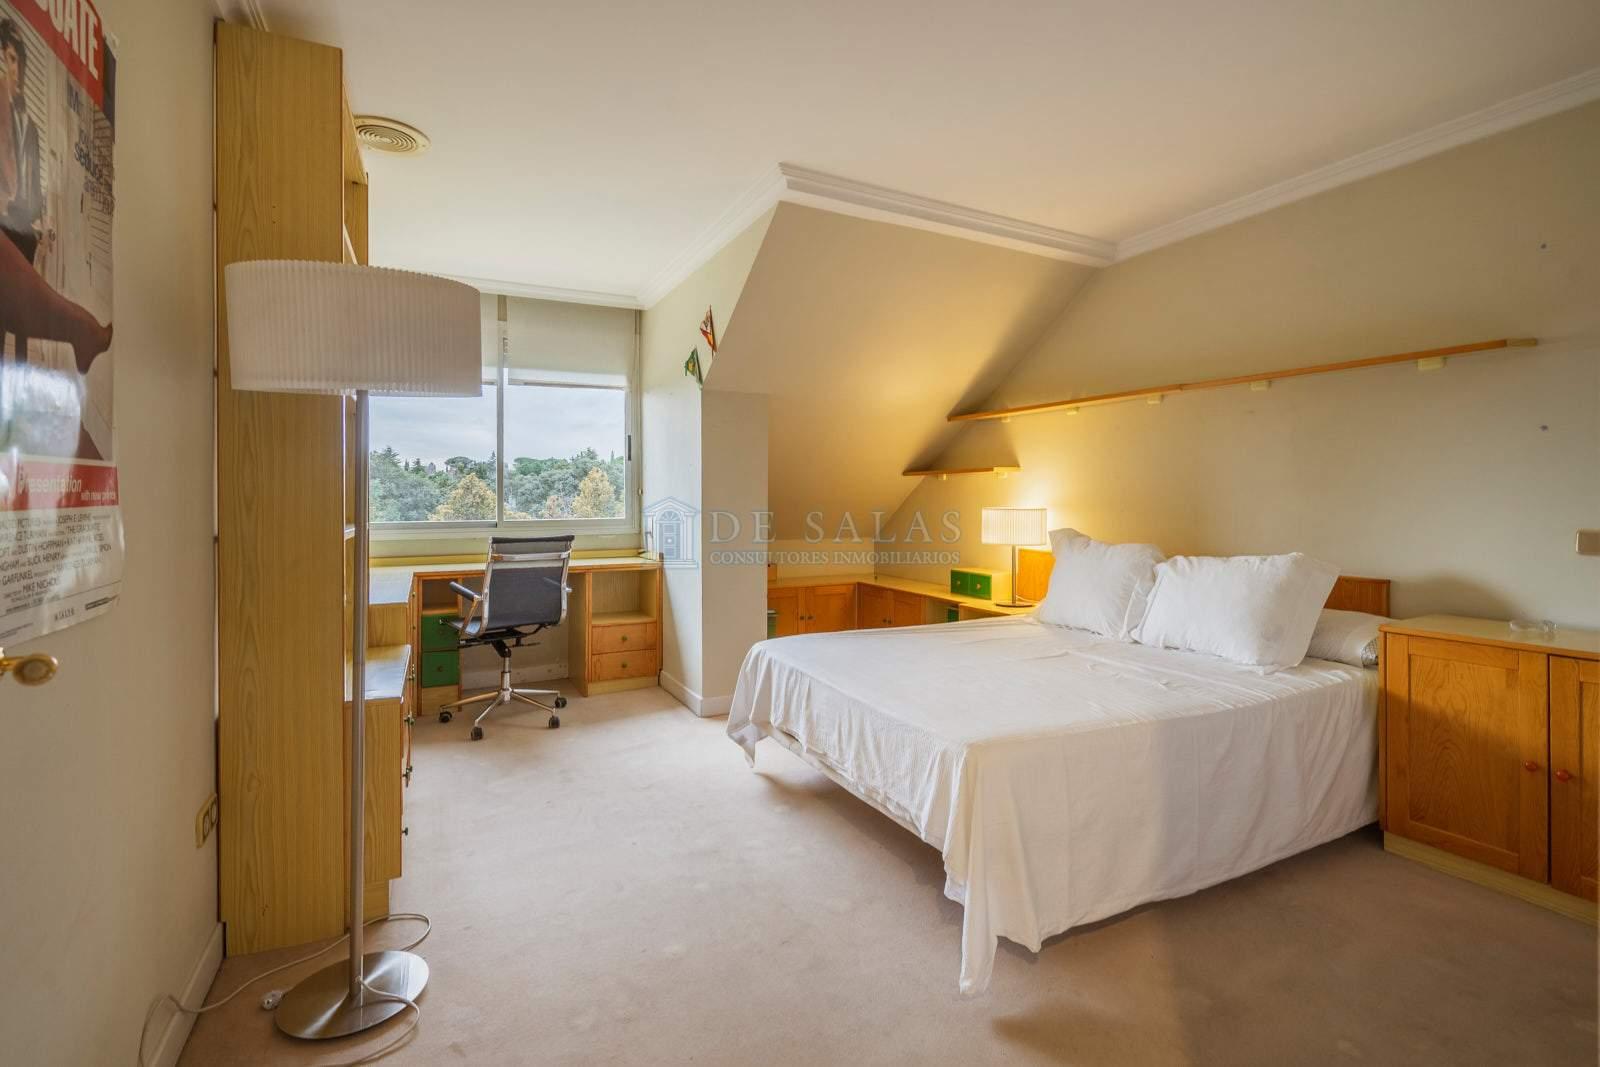 Dormitorio-32 Chalet La Moraleja